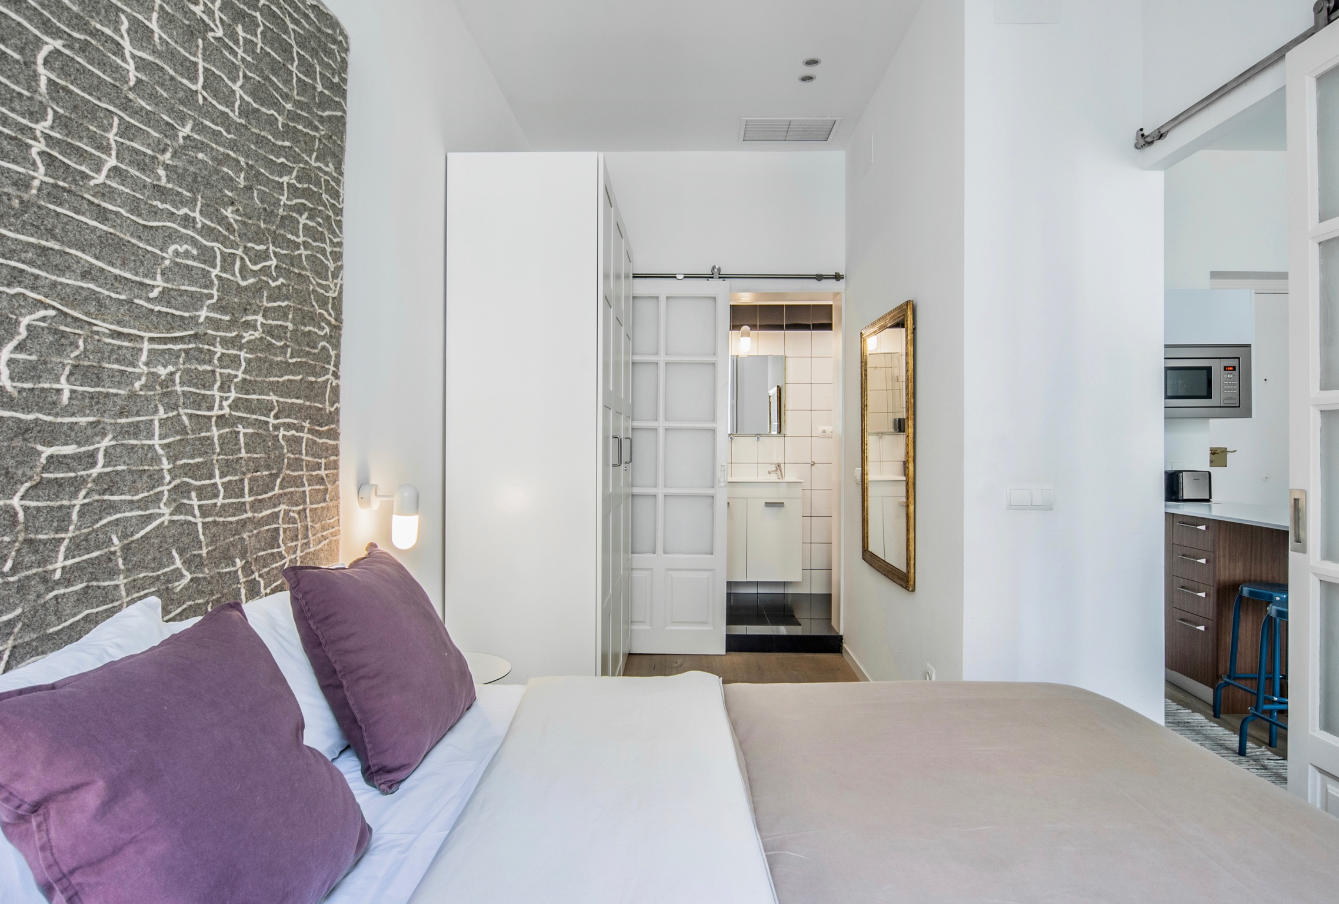 Dormitorio, detalle armario, Desengaño